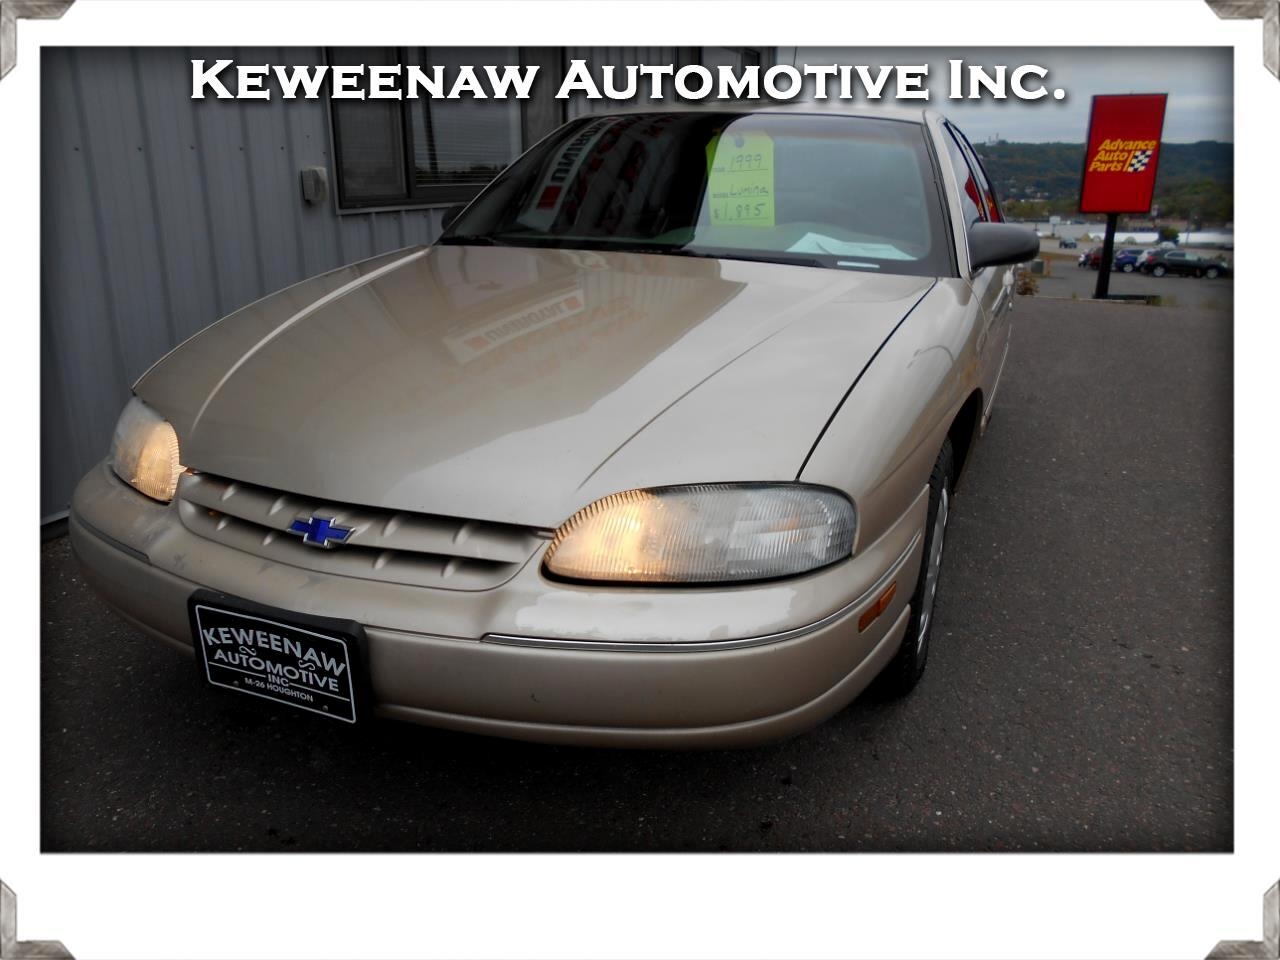 1999 Chevrolet Lumina 4dr Sdn